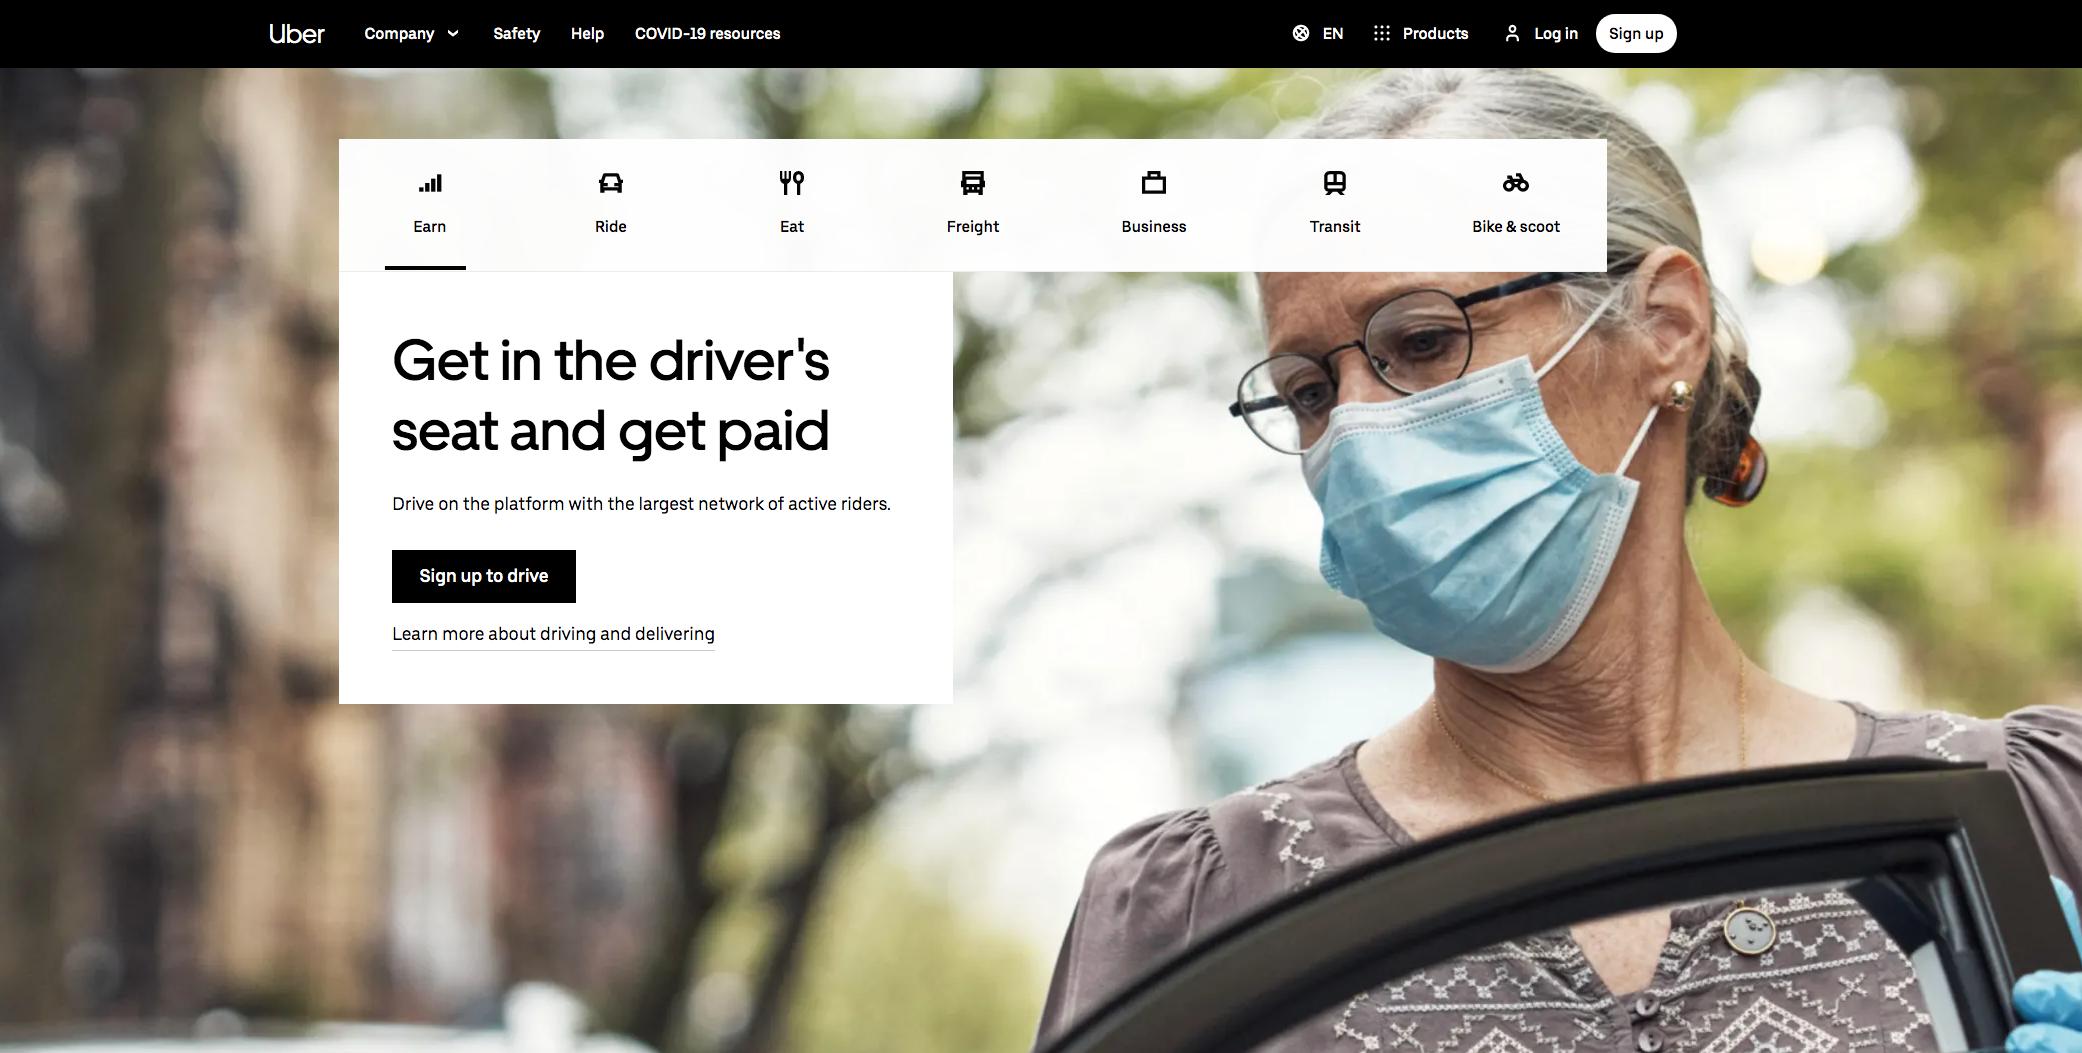 How does online marketplace Uber make money